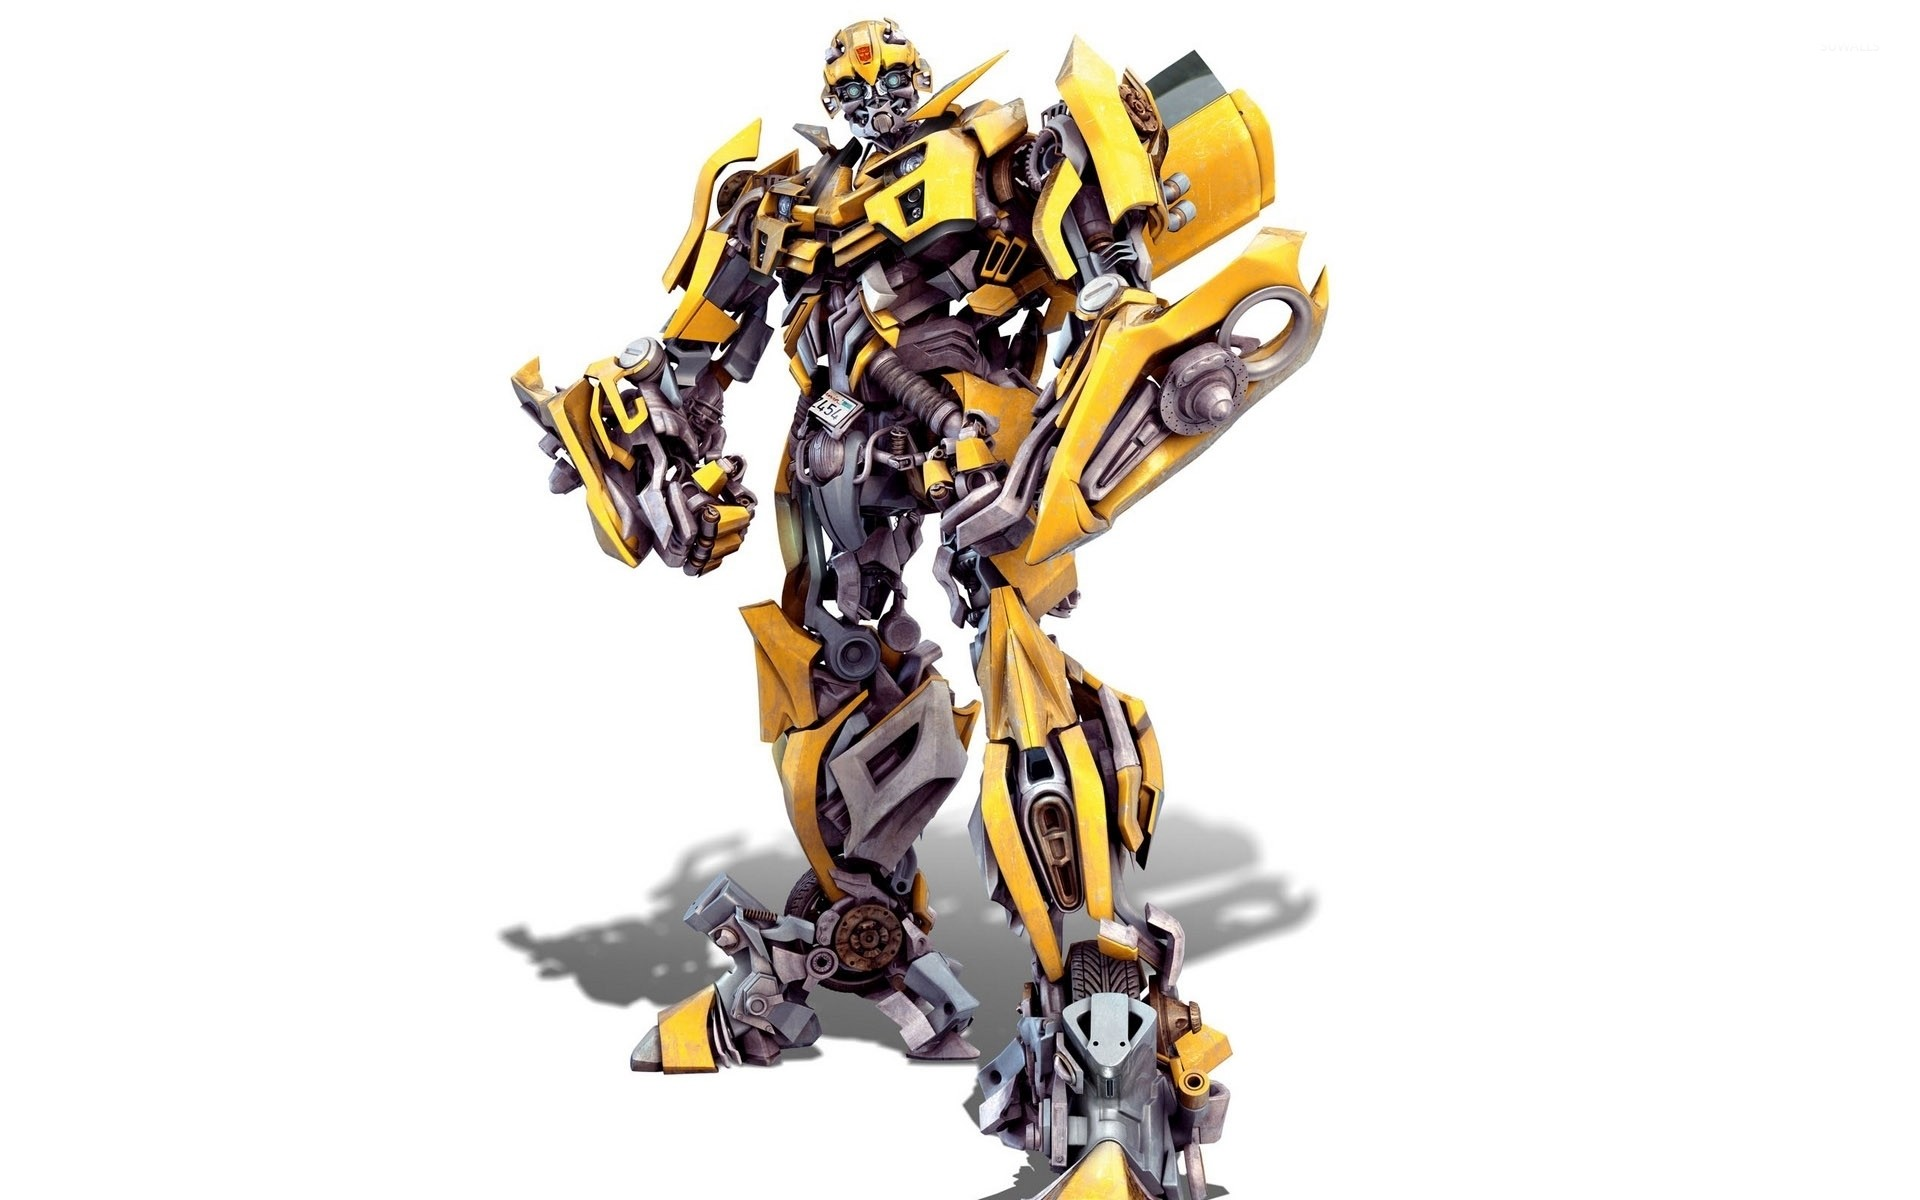 Res: 1920x1200, Bumblebee - Transformers [6] wallpaper